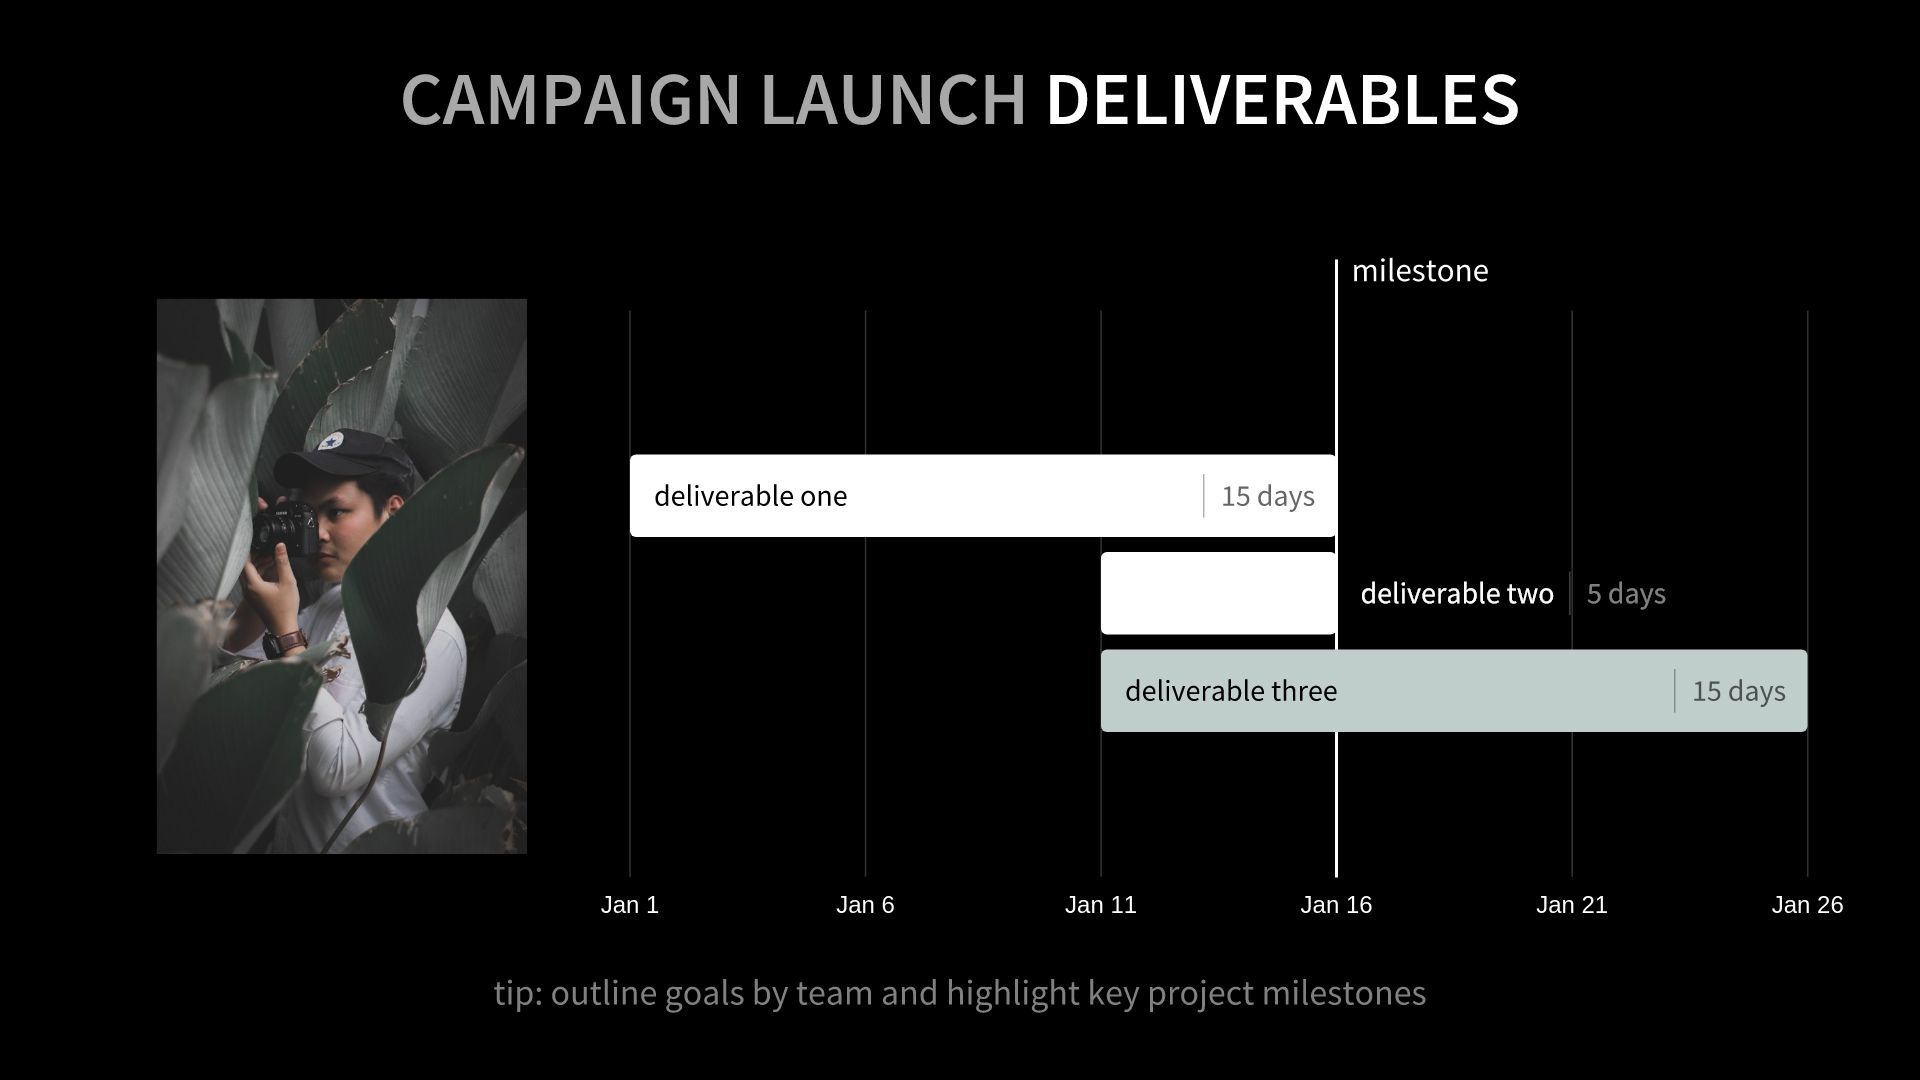 Campaign Deliverables